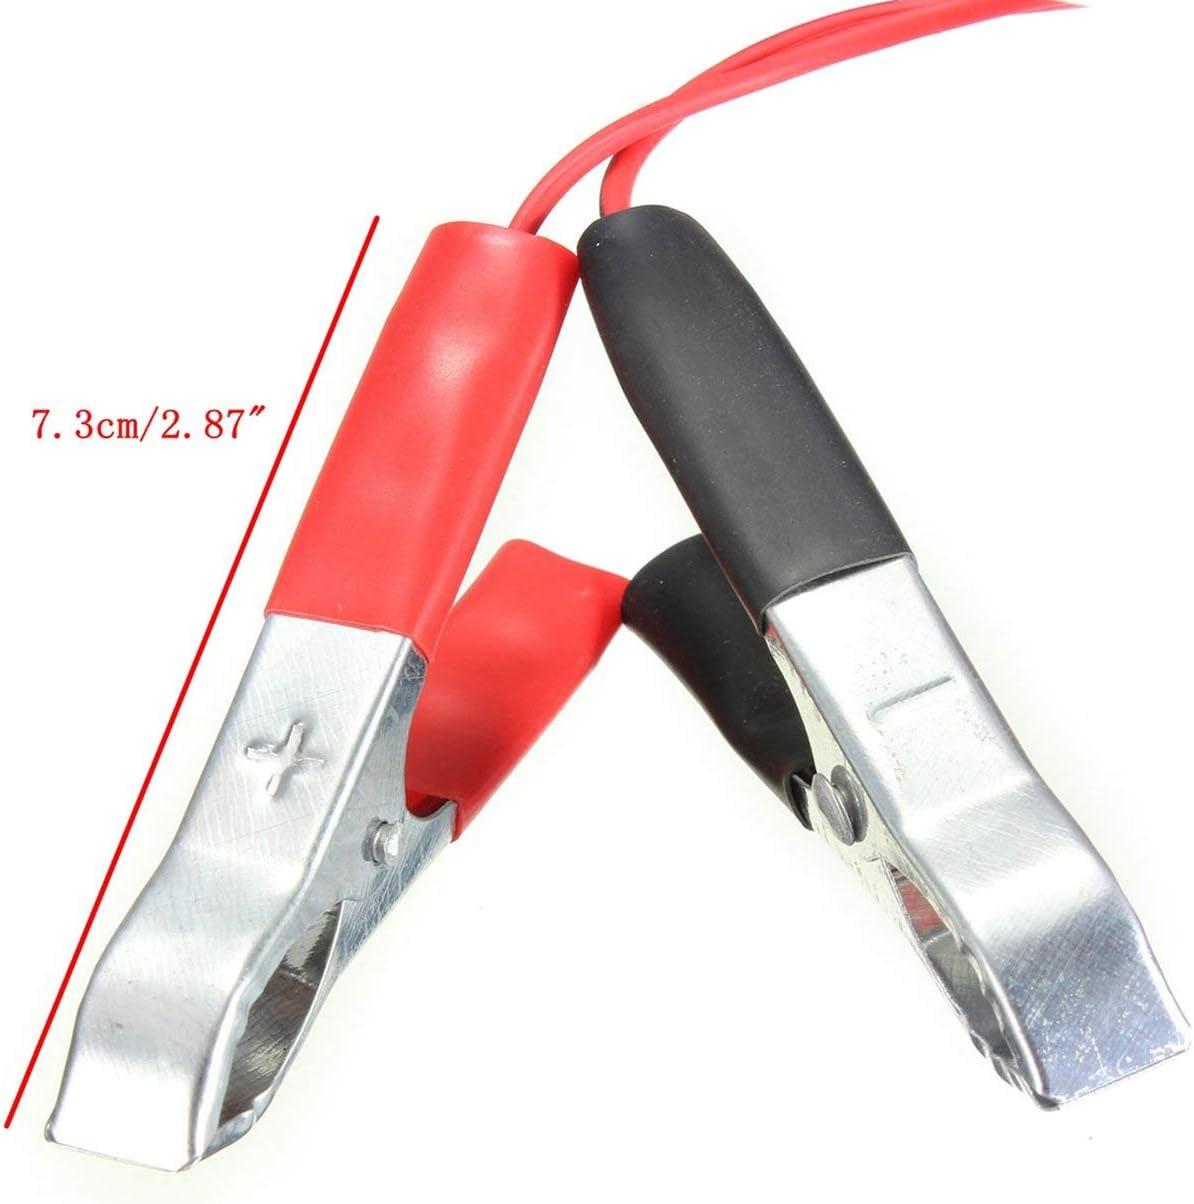 12V Auto-Hilfs Zigarettenanz/ünder Batterie Krokodilklemmen Adapter